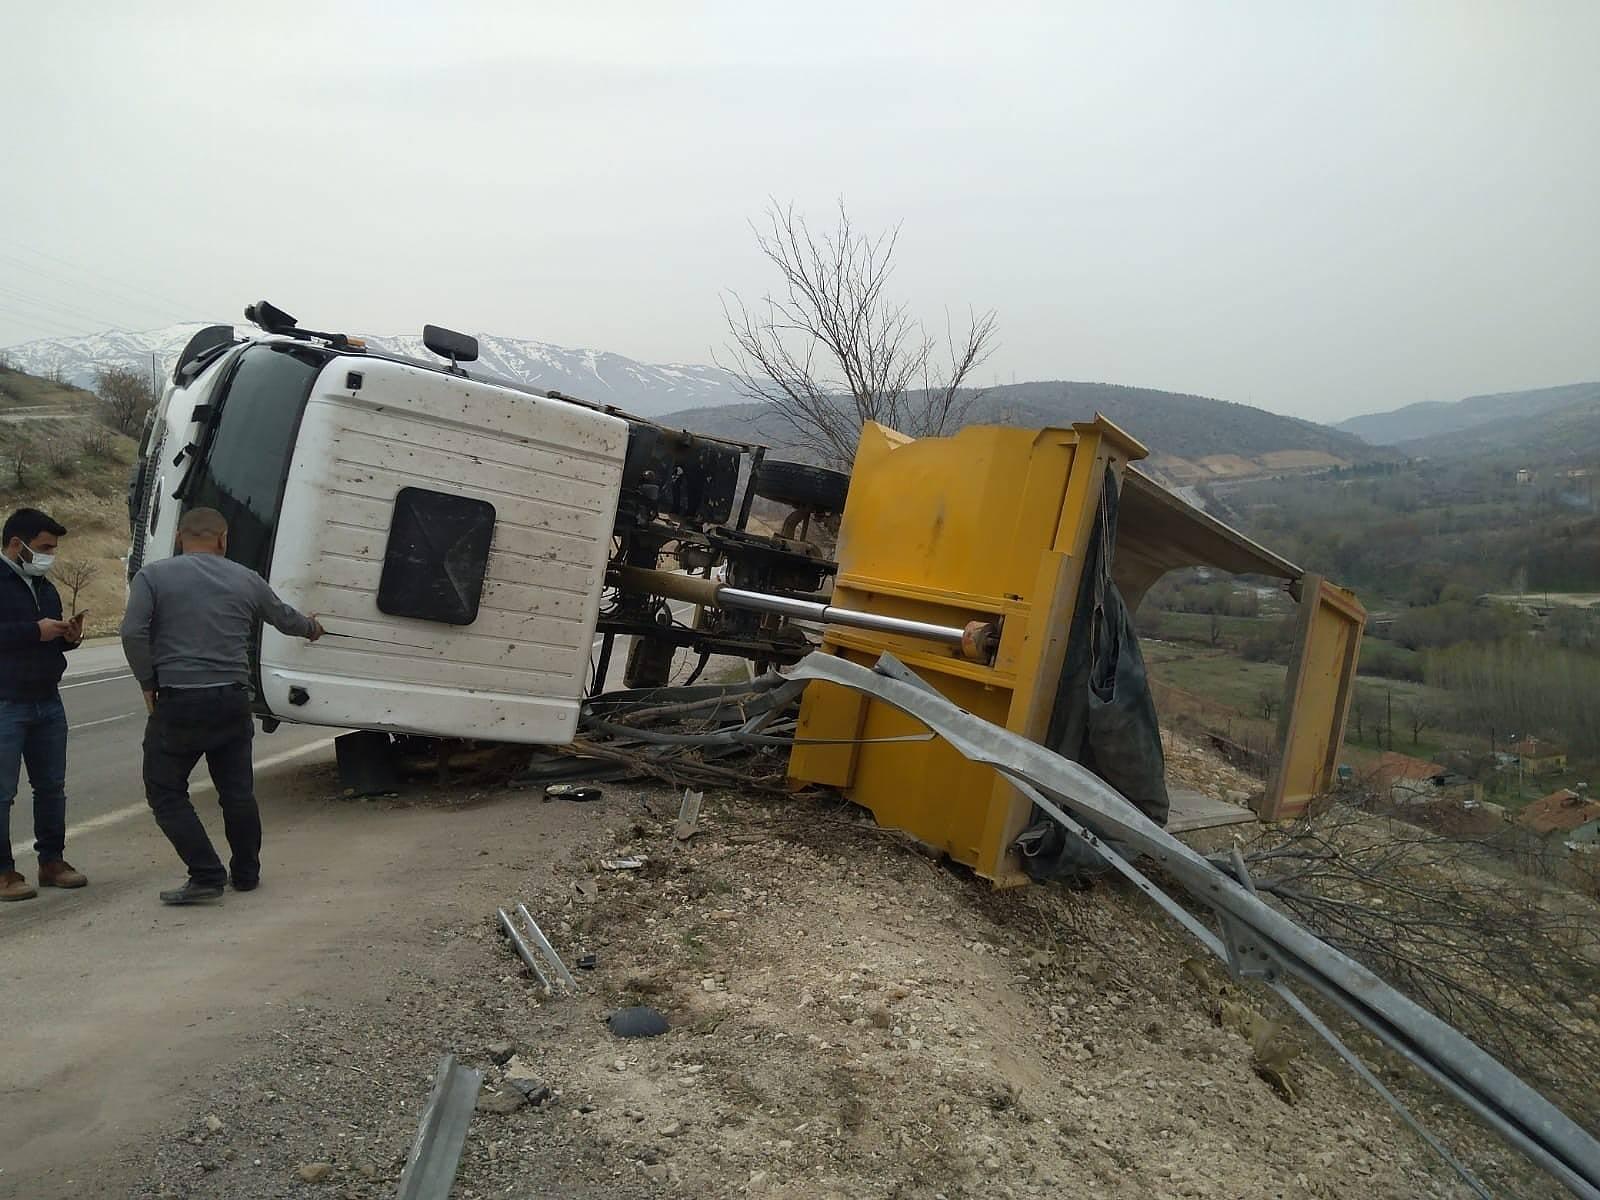 2021/04/hafriyat-kamyonu-devrildi-1-yarali-20210406AW28-1.jpg